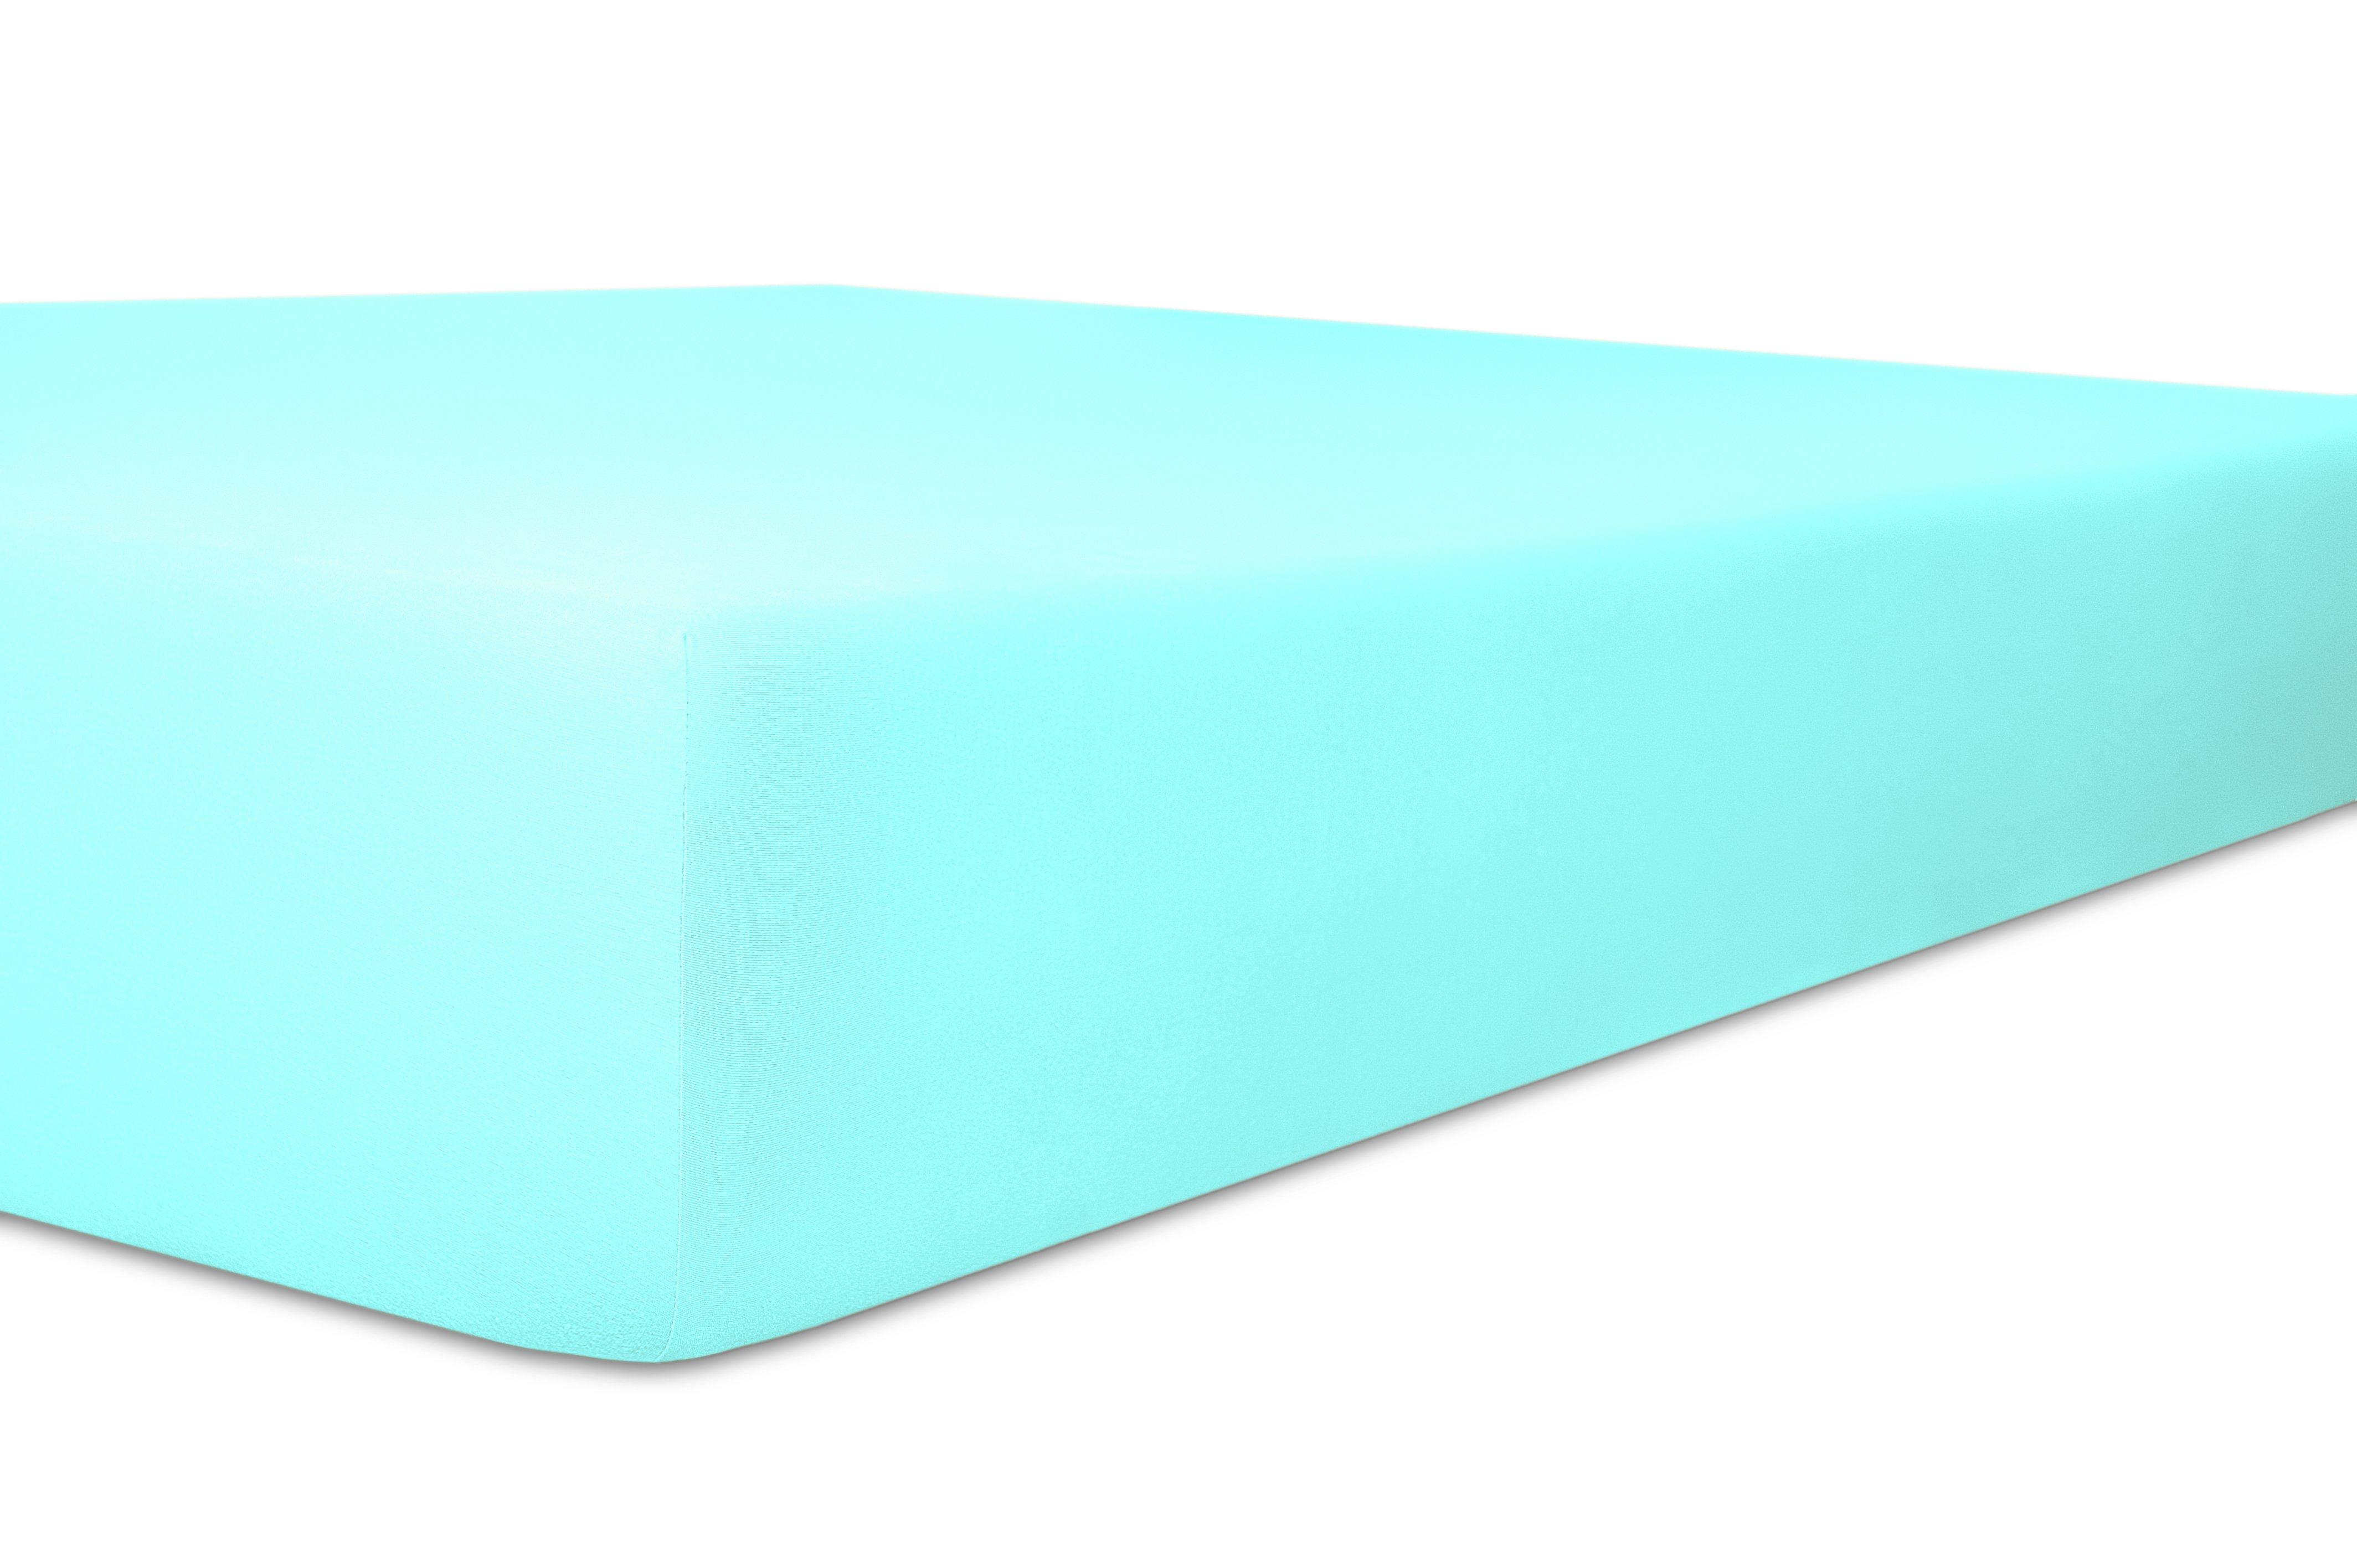 Exclusive-Stretch aqua B180cm